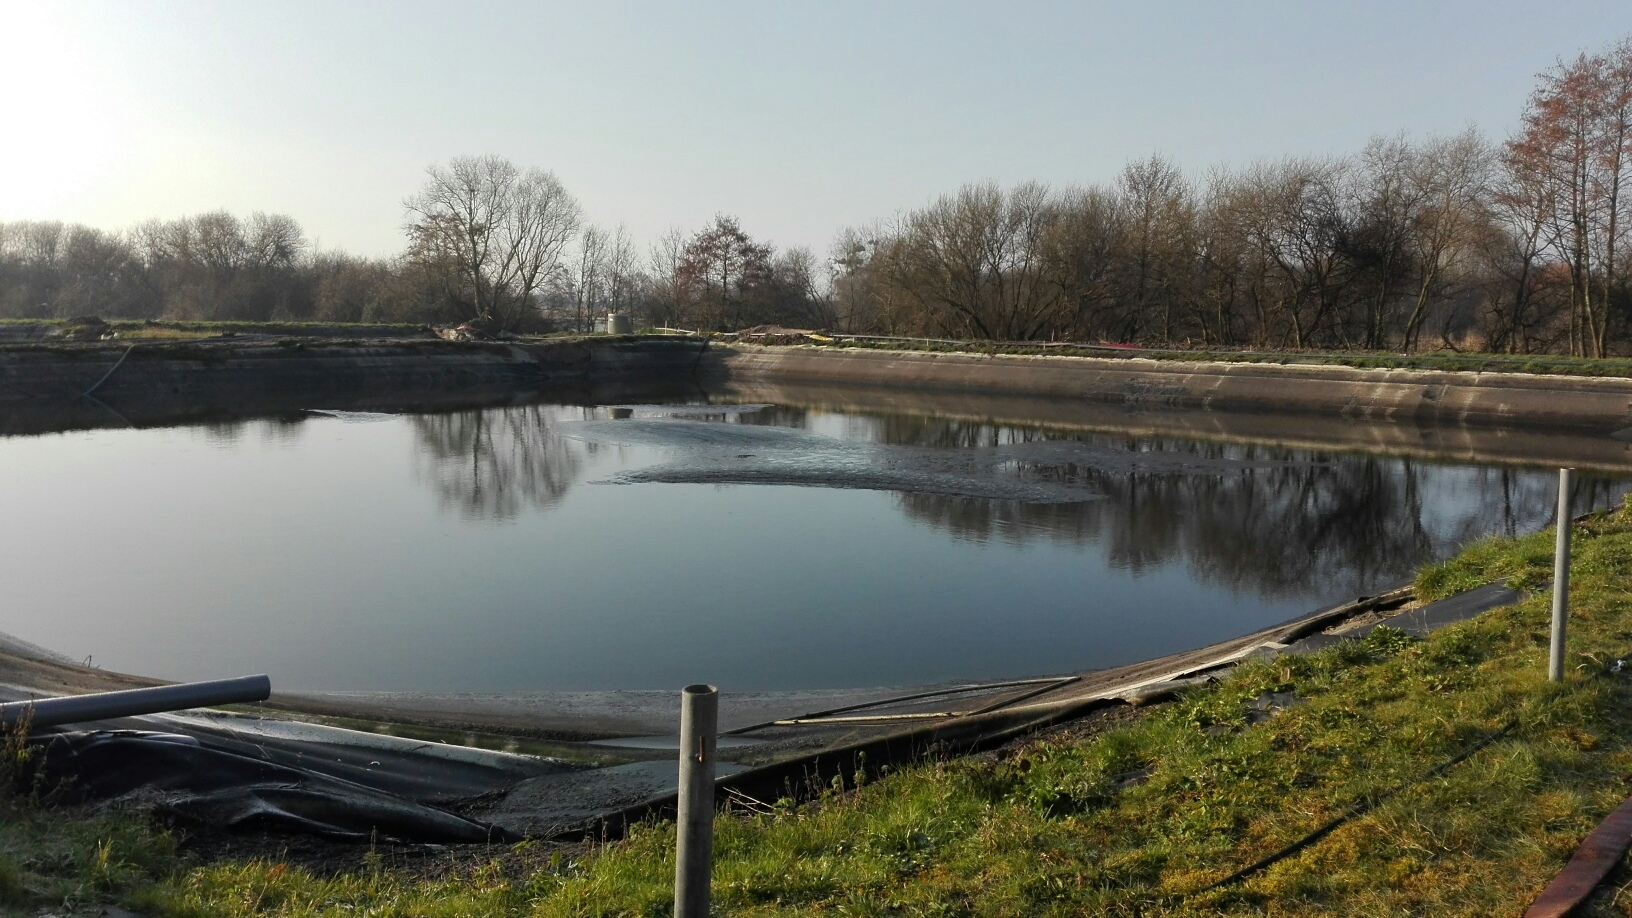 grand bassin en cours de vidage